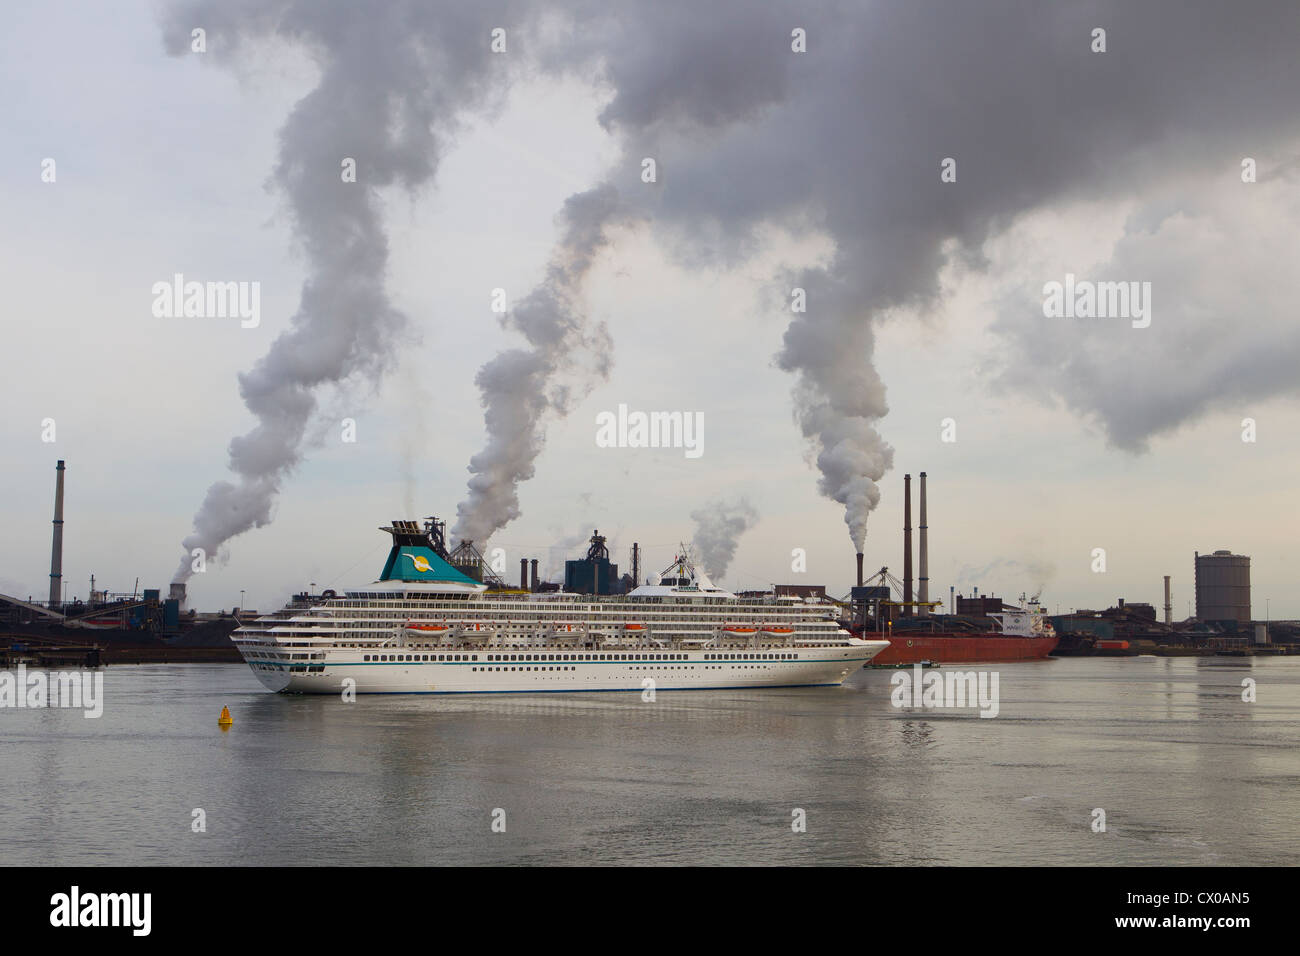 artania cruise passenger liner ship ijmuiden port - Stock Image